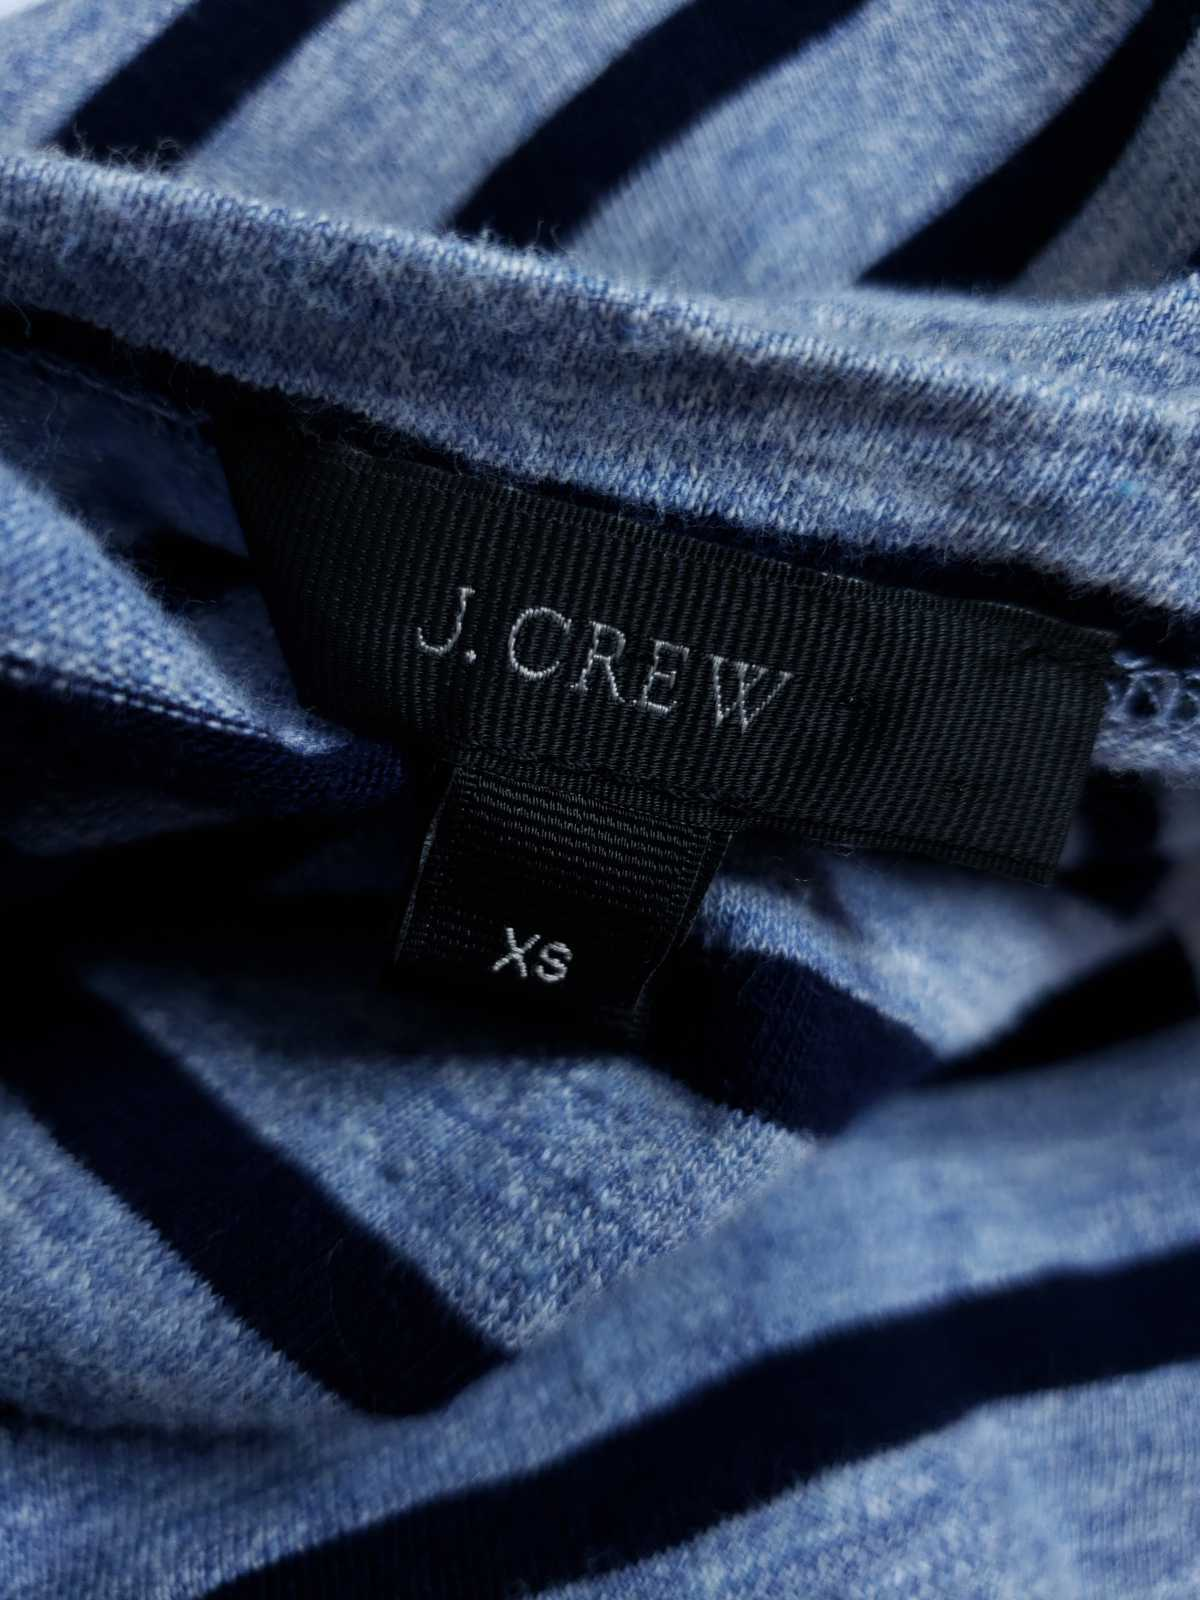 J.Crew Women XS Dress Striped Side Zip Tshirt Cotton Long Sleeve Casual image 5